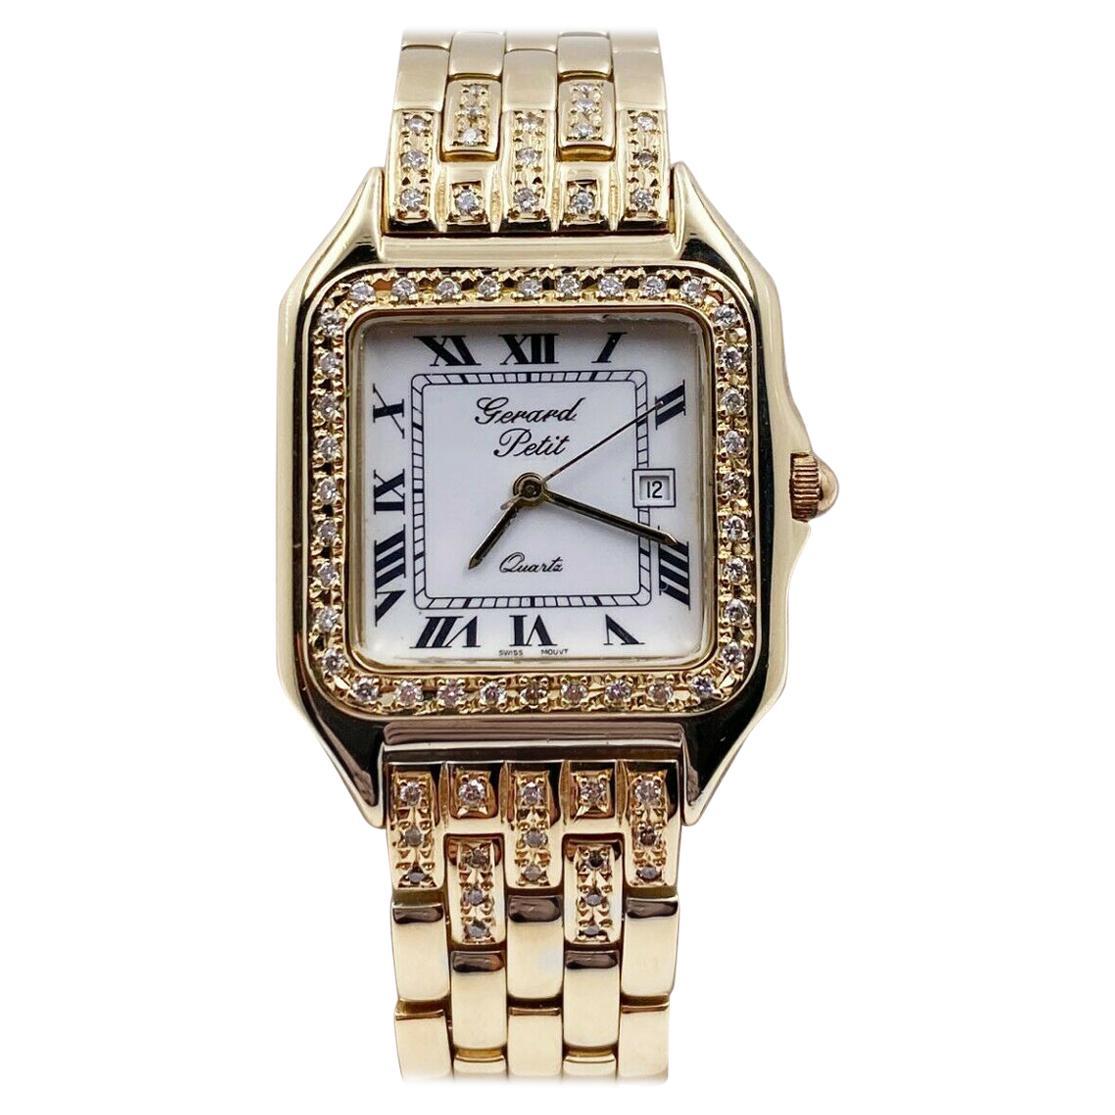 Gerard Petit Date 14 Karat Yellow Gold Diamond Bezel Diamond Accented